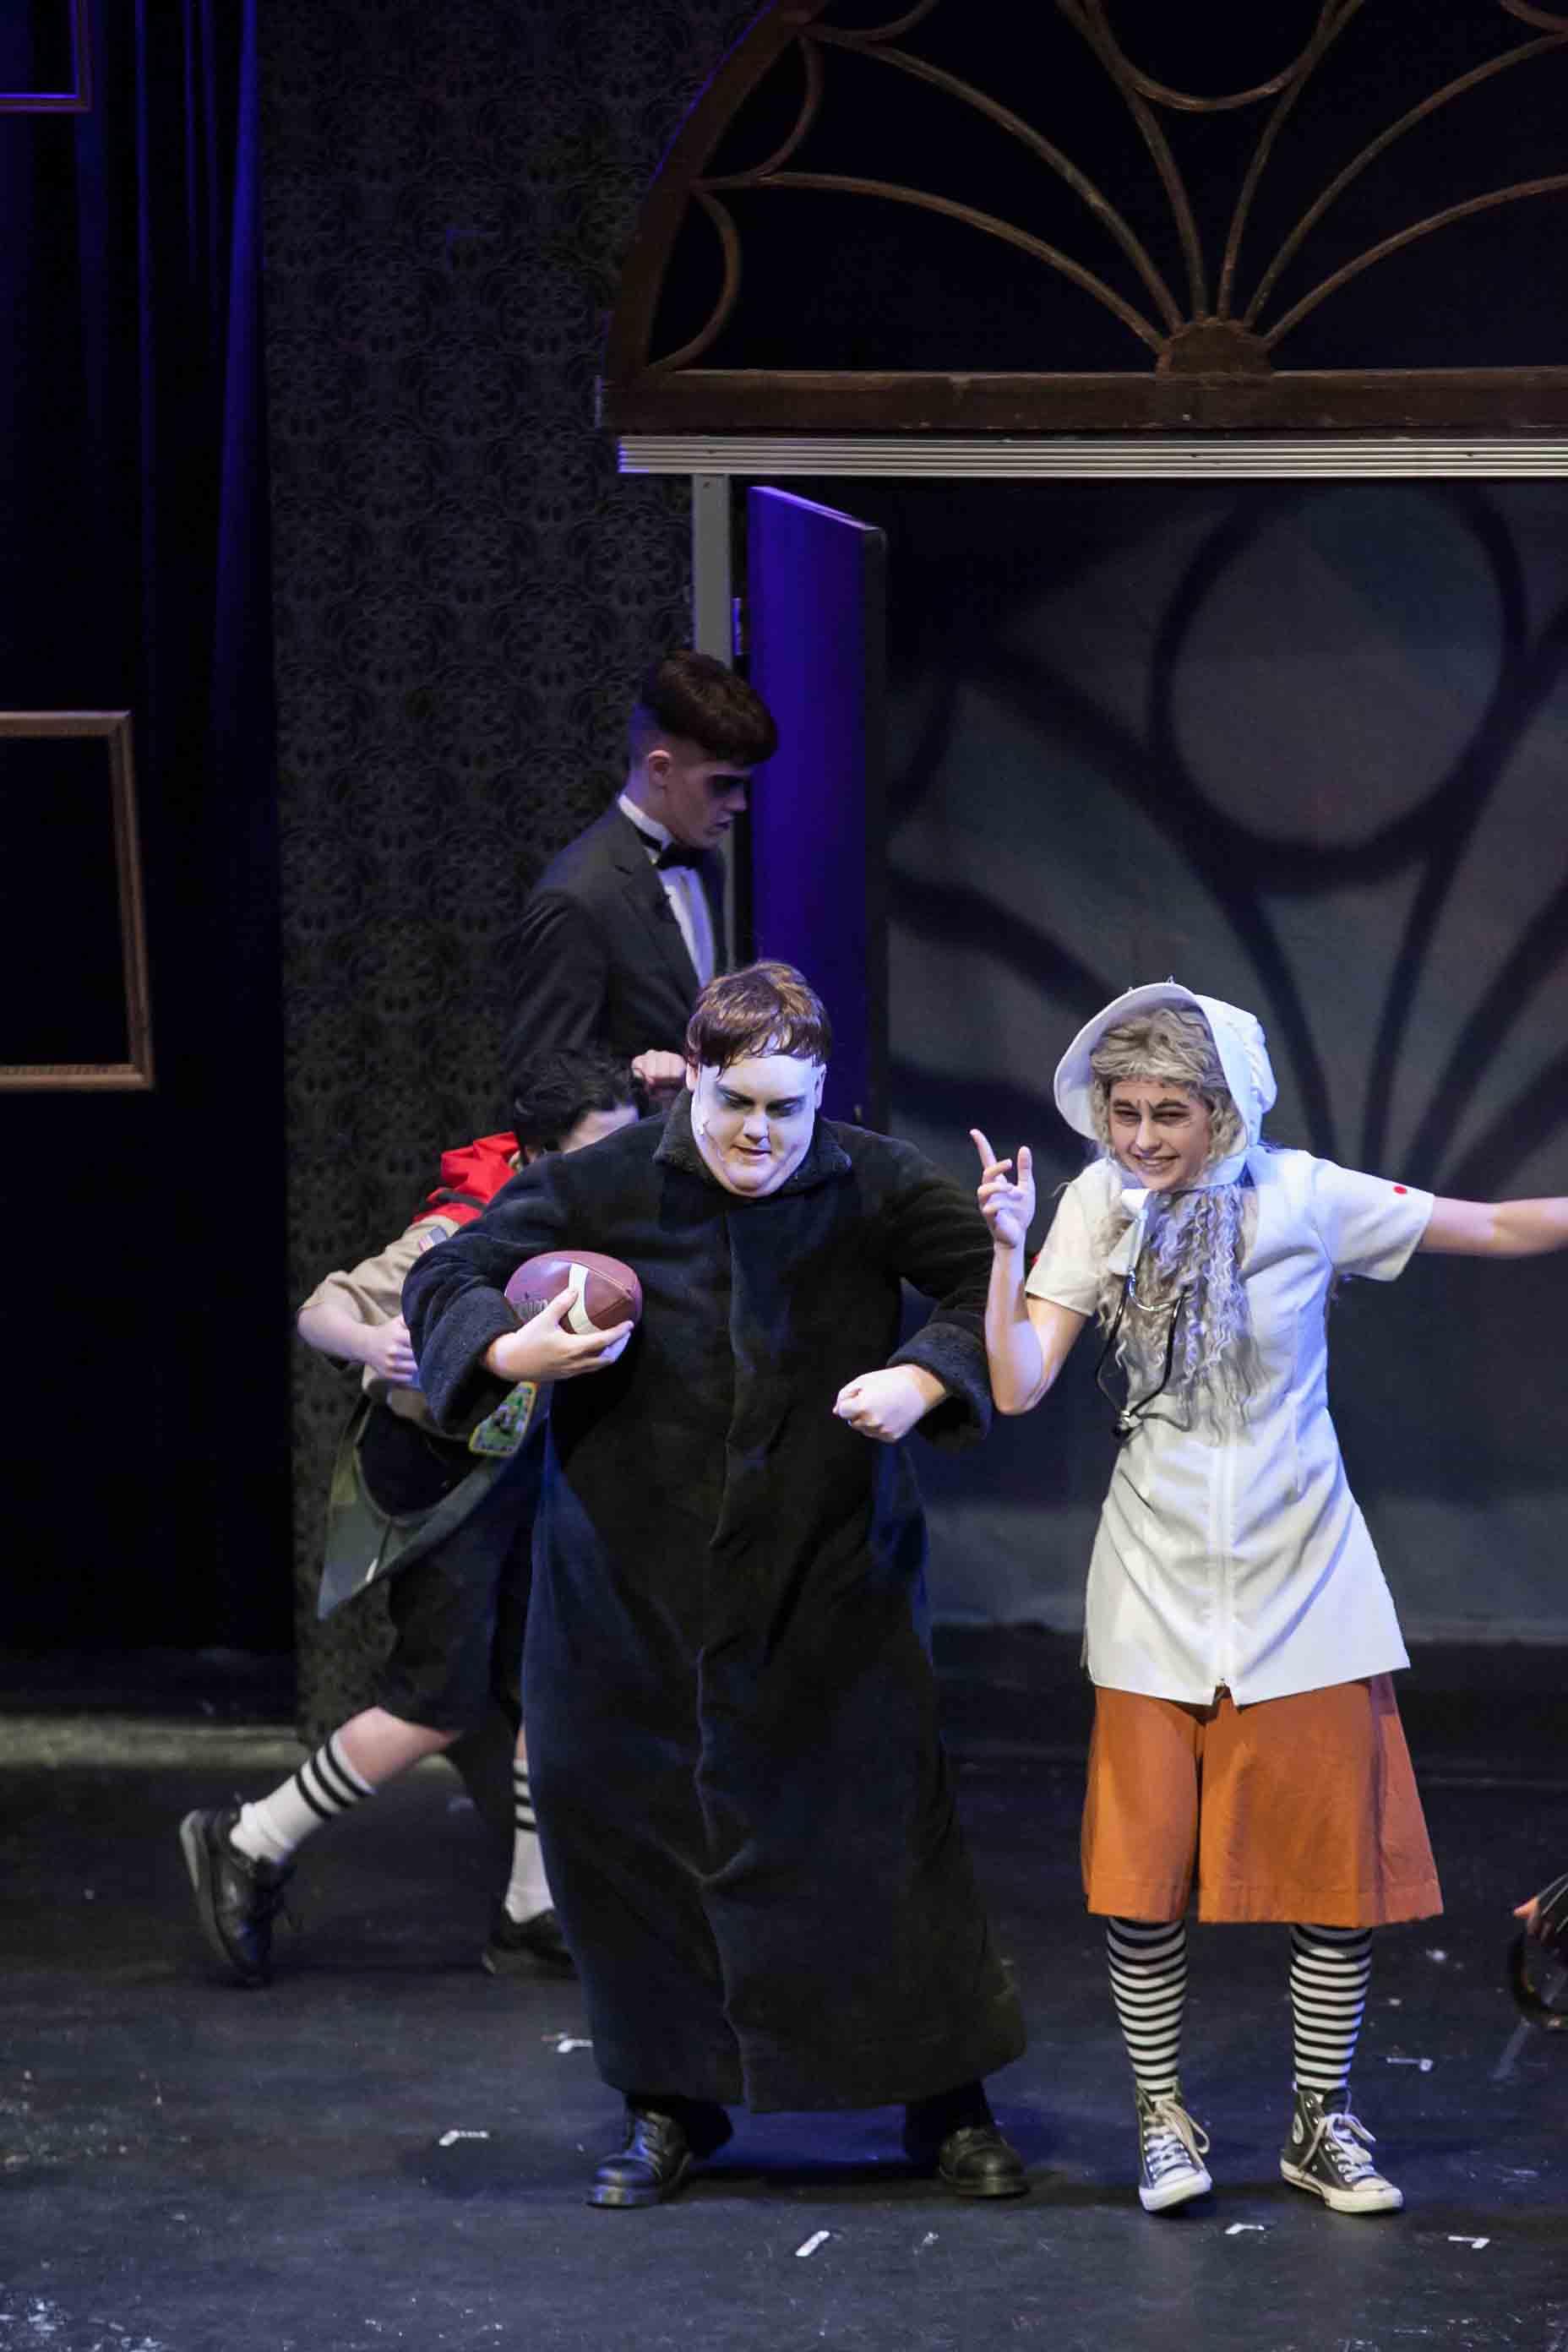 6-19-16 Addams Family Kooky Cast 0164.jpg